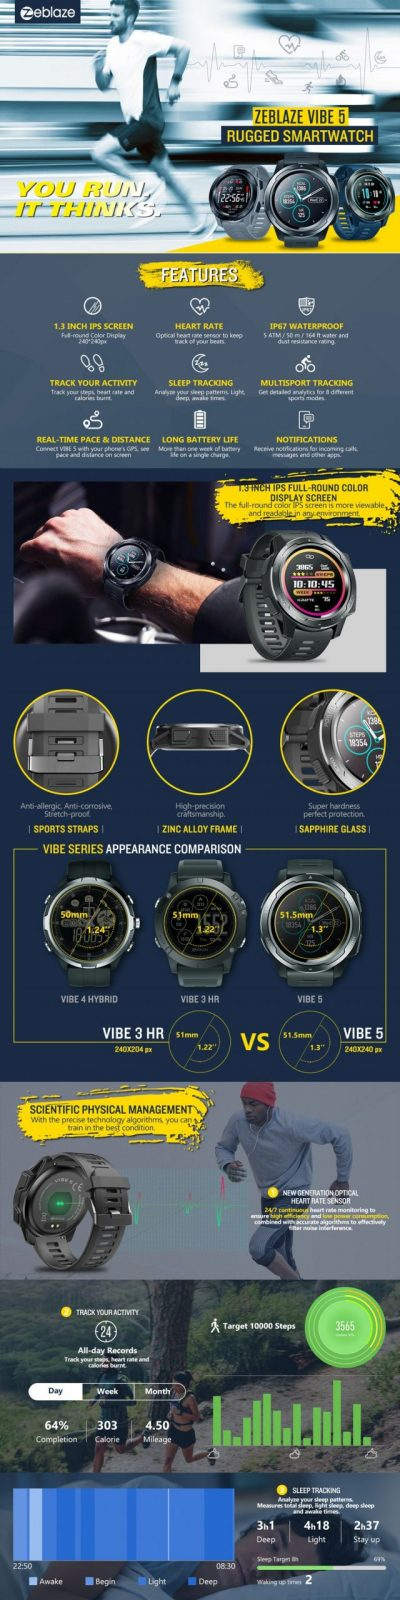 Zeblaze Vibe 5 Smartwatch (1)